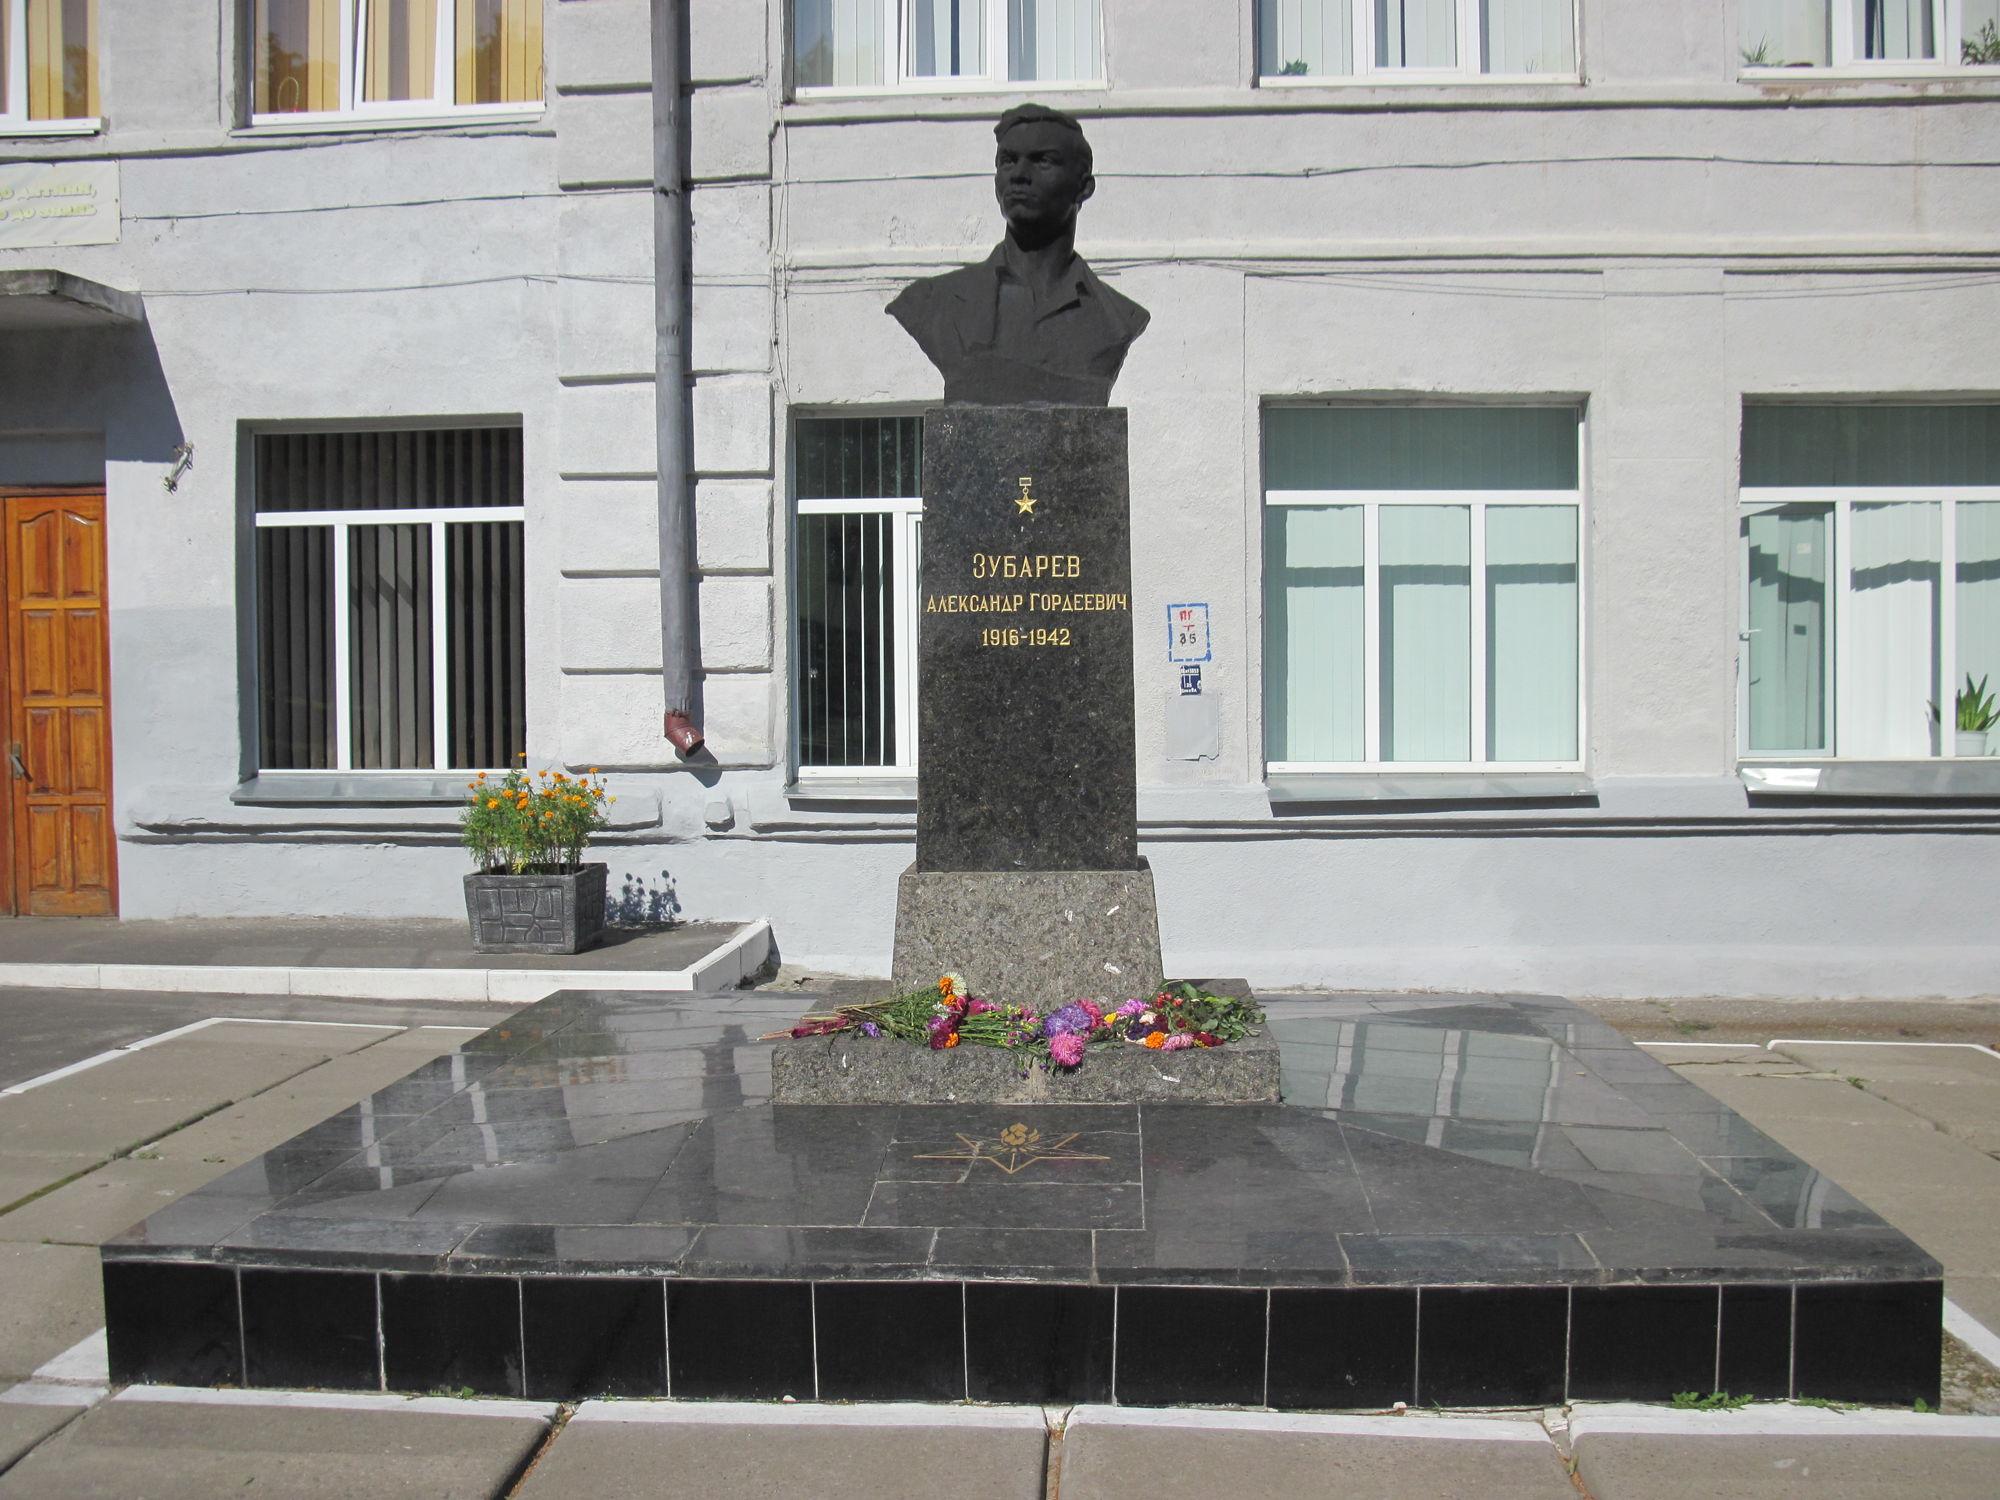 Gloria e orgoglio del Donbass: Aleksandr Gordeevič Zubarev